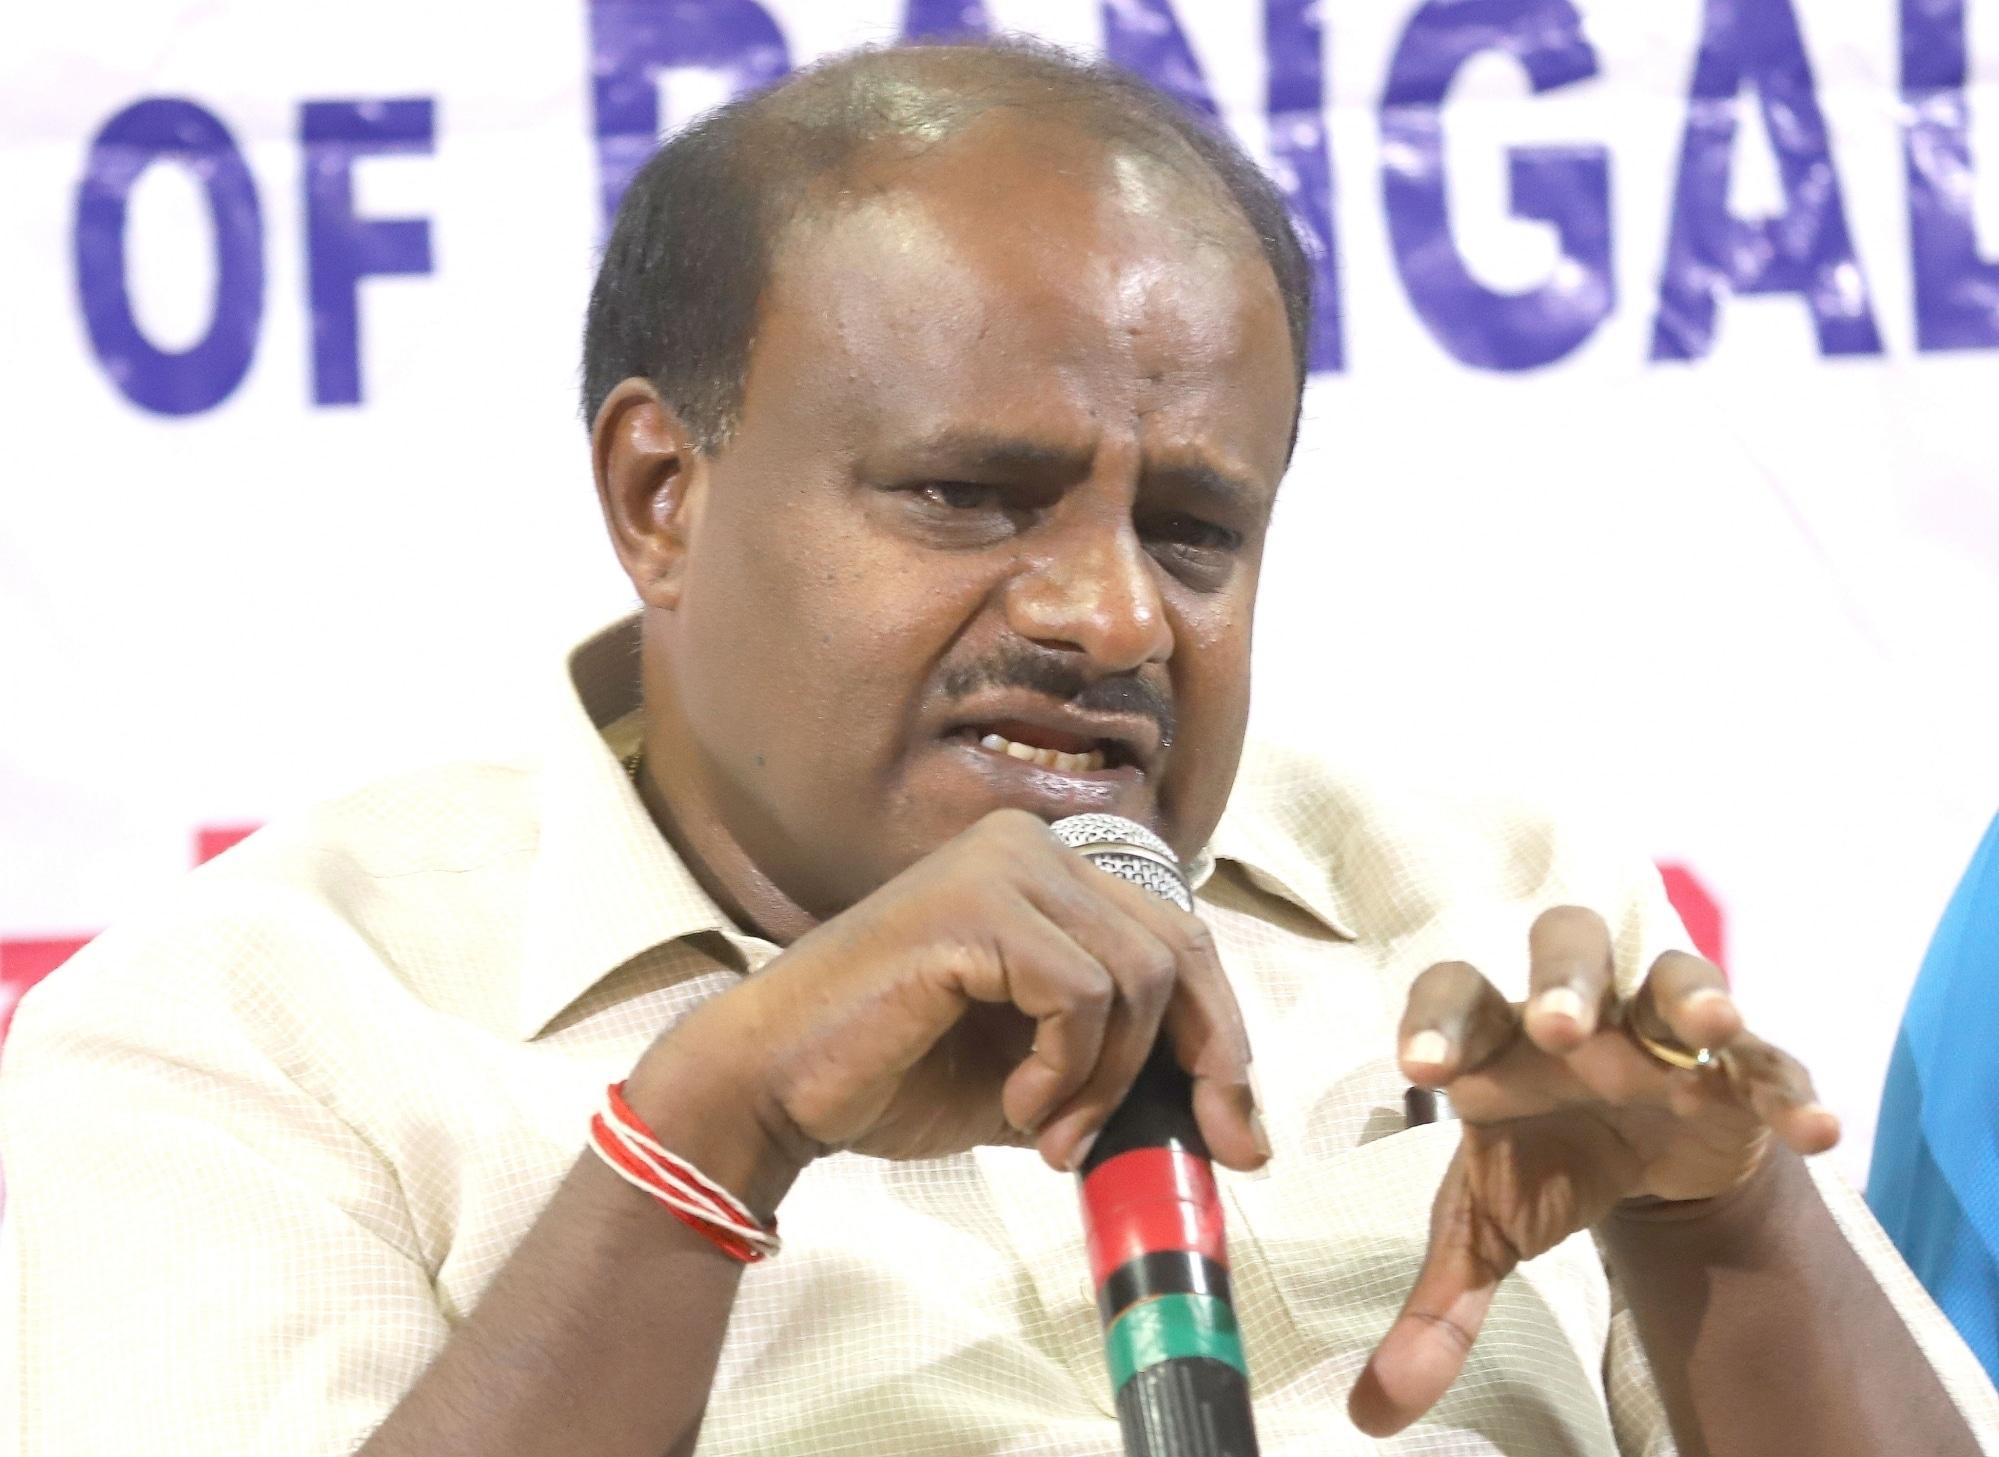 Karnataka chief minister and Janata Dal (Secular) leader HD Kumaraswamy. (Image: IANS)